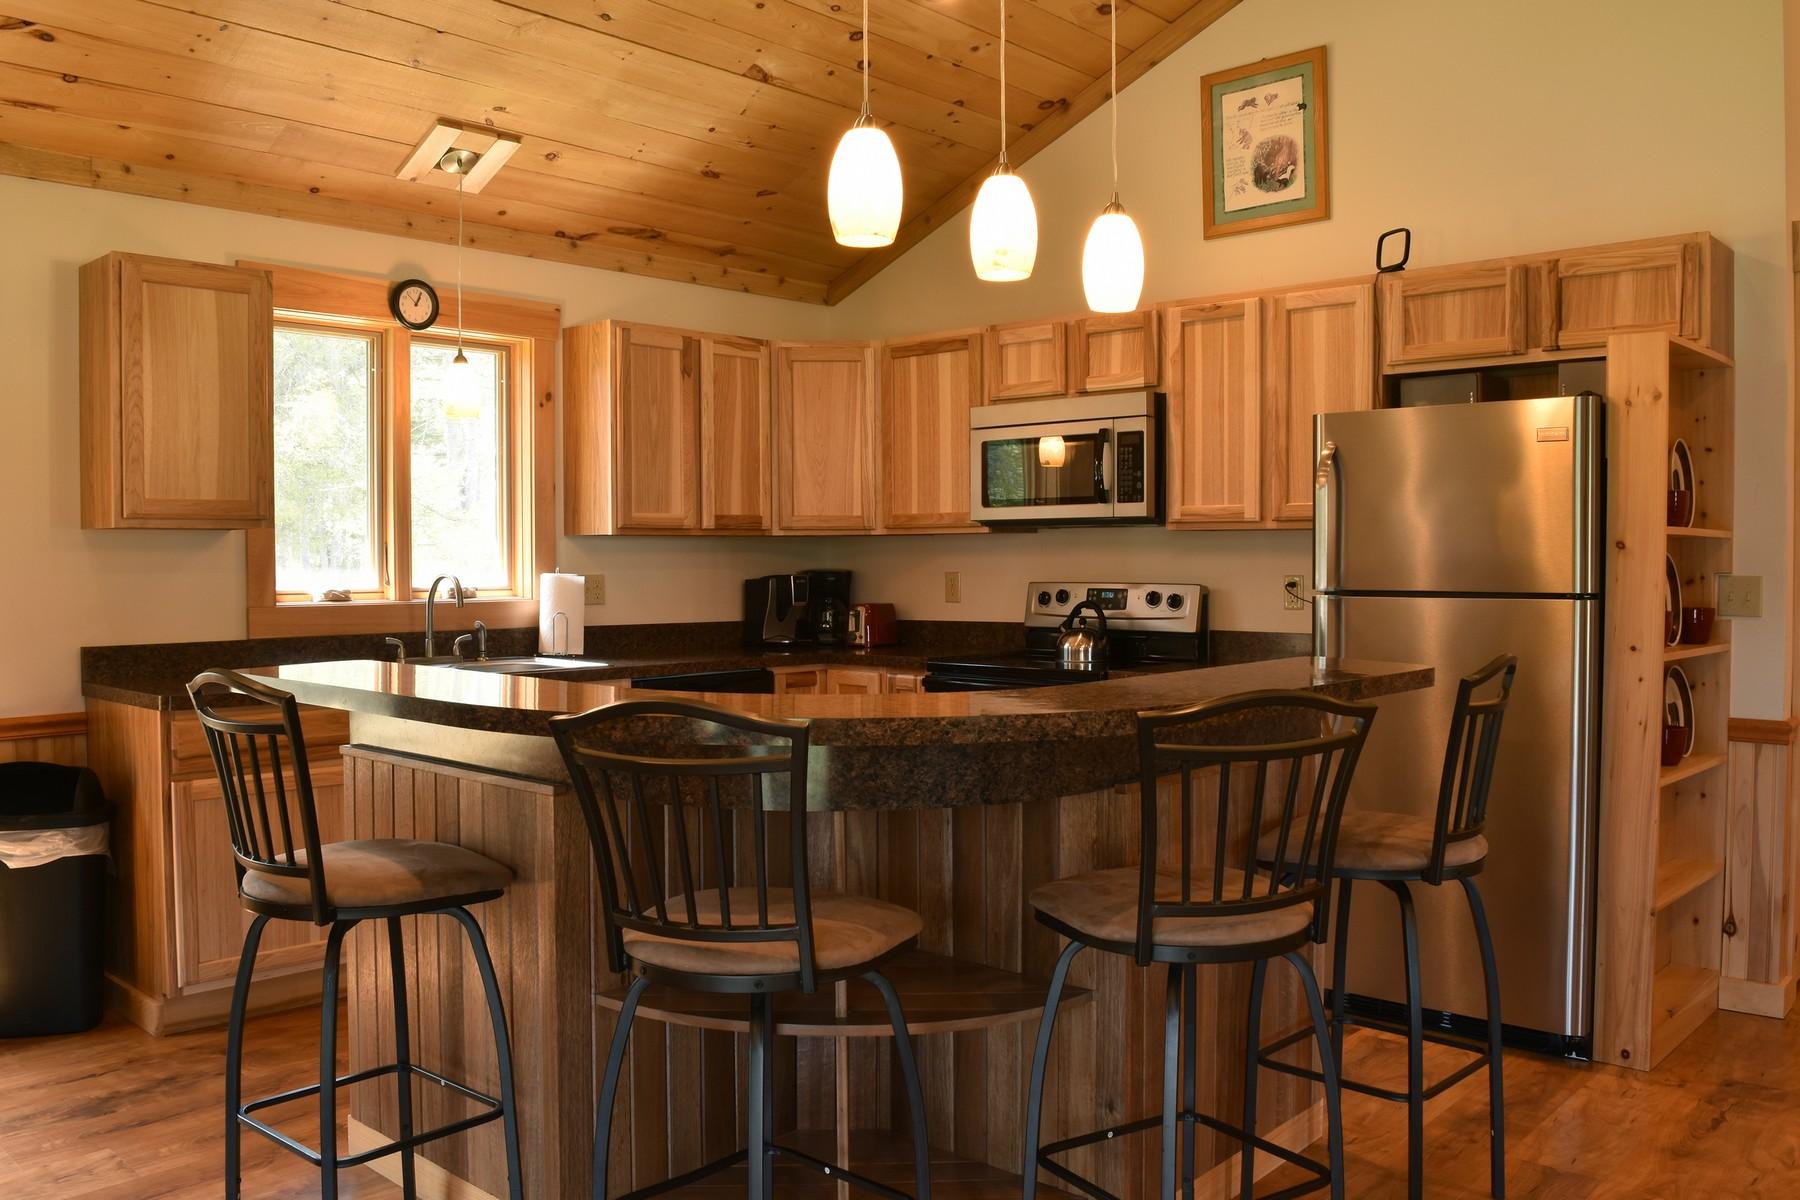 Additional photo for property listing at New Log Chalet 6  Bianca Rd Stony Creek, Nueva York 12878 Estados Unidos